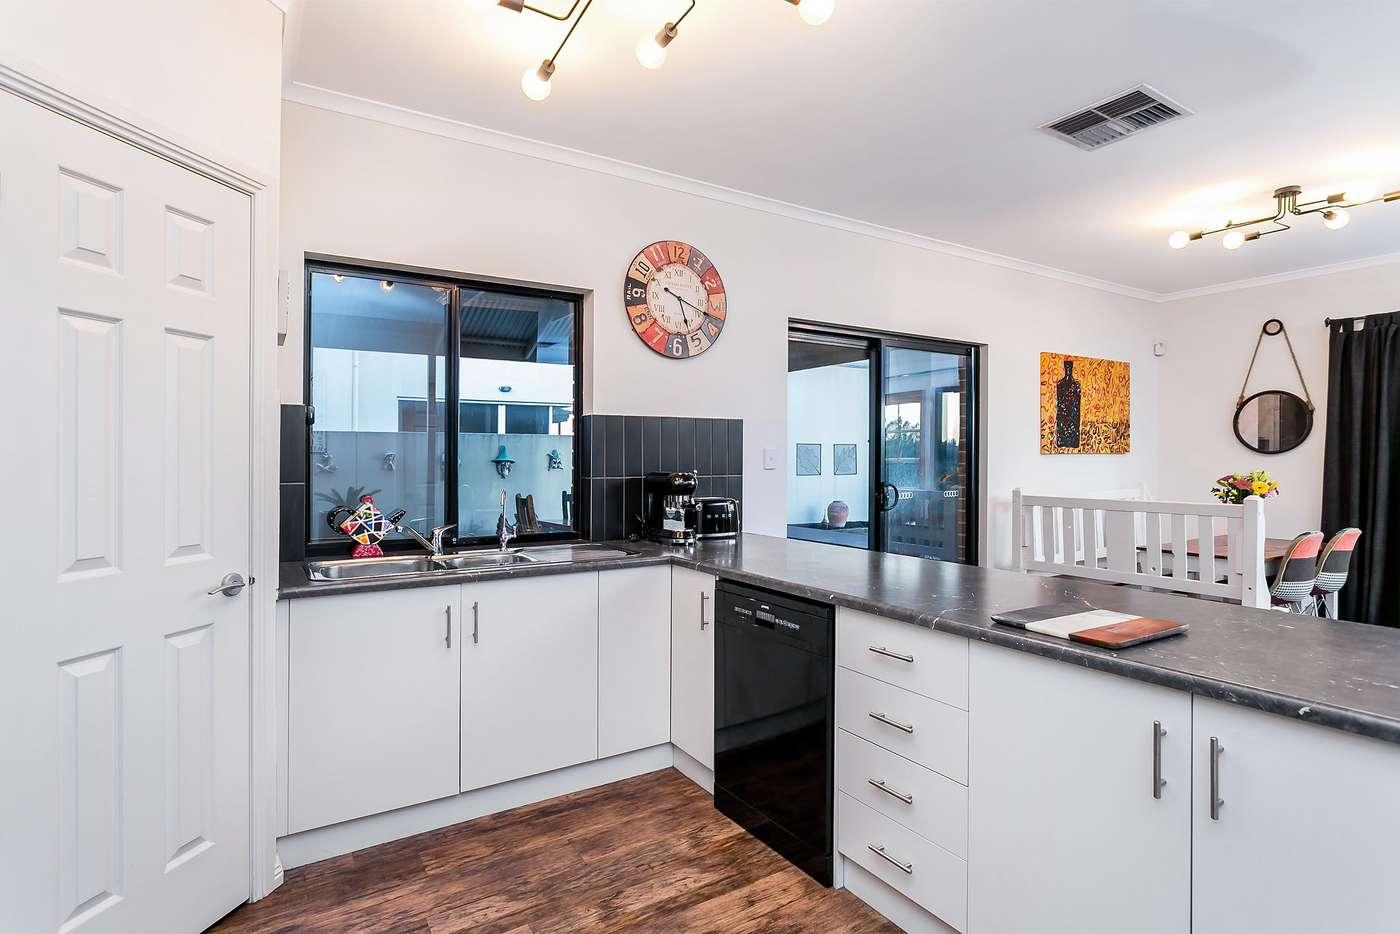 Seventh view of Homely house listing, 12 Pelican Lane, Mawson Lakes SA 5095